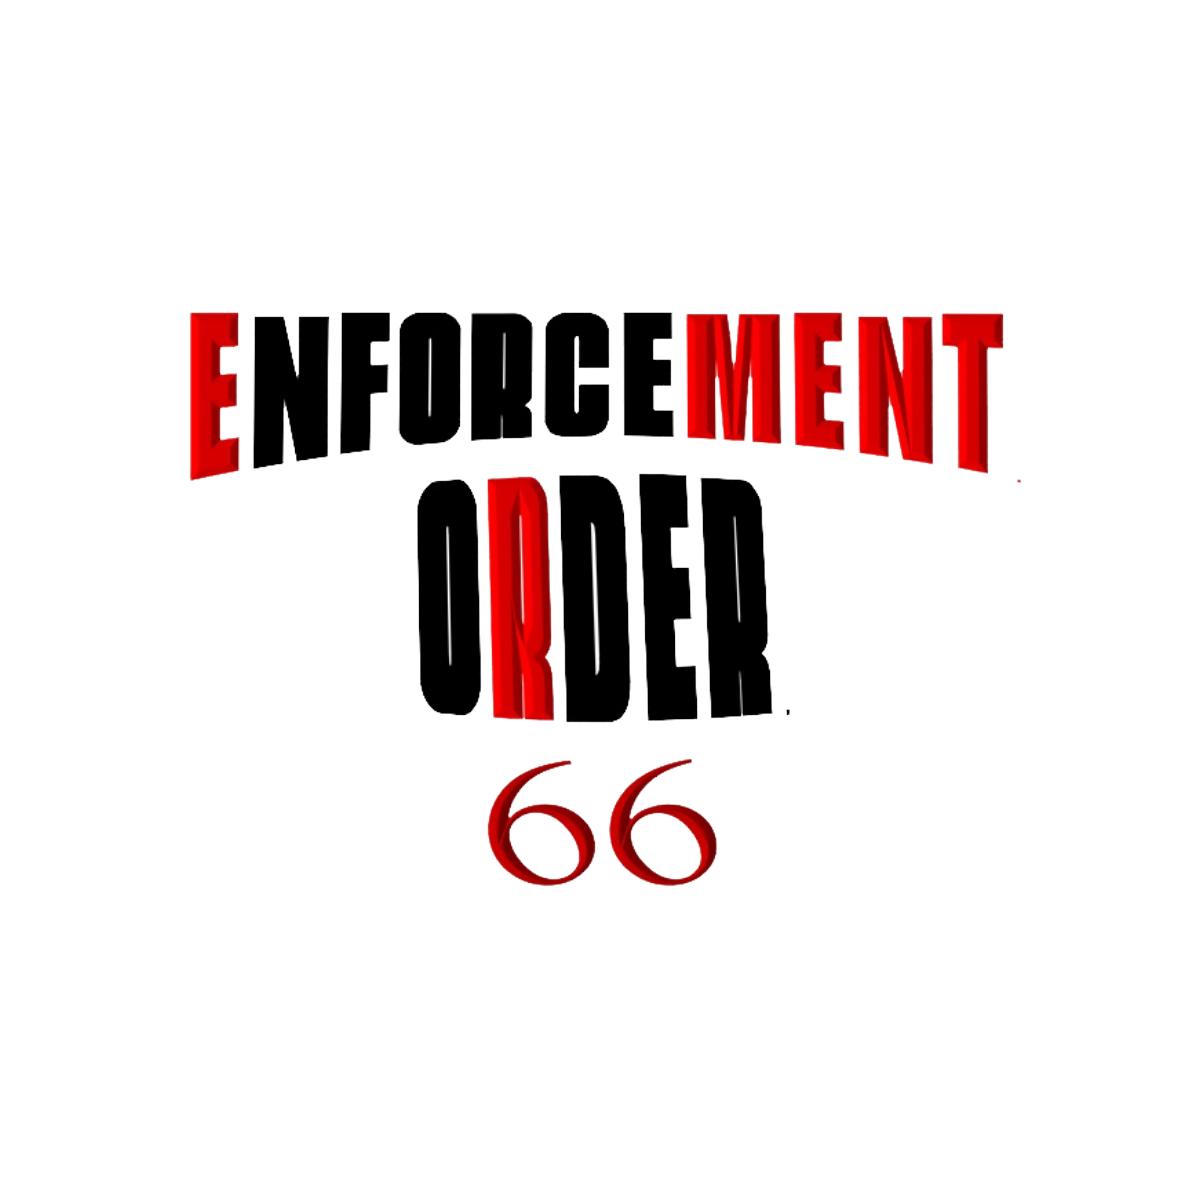 ENFORCEMENT ORDER 66